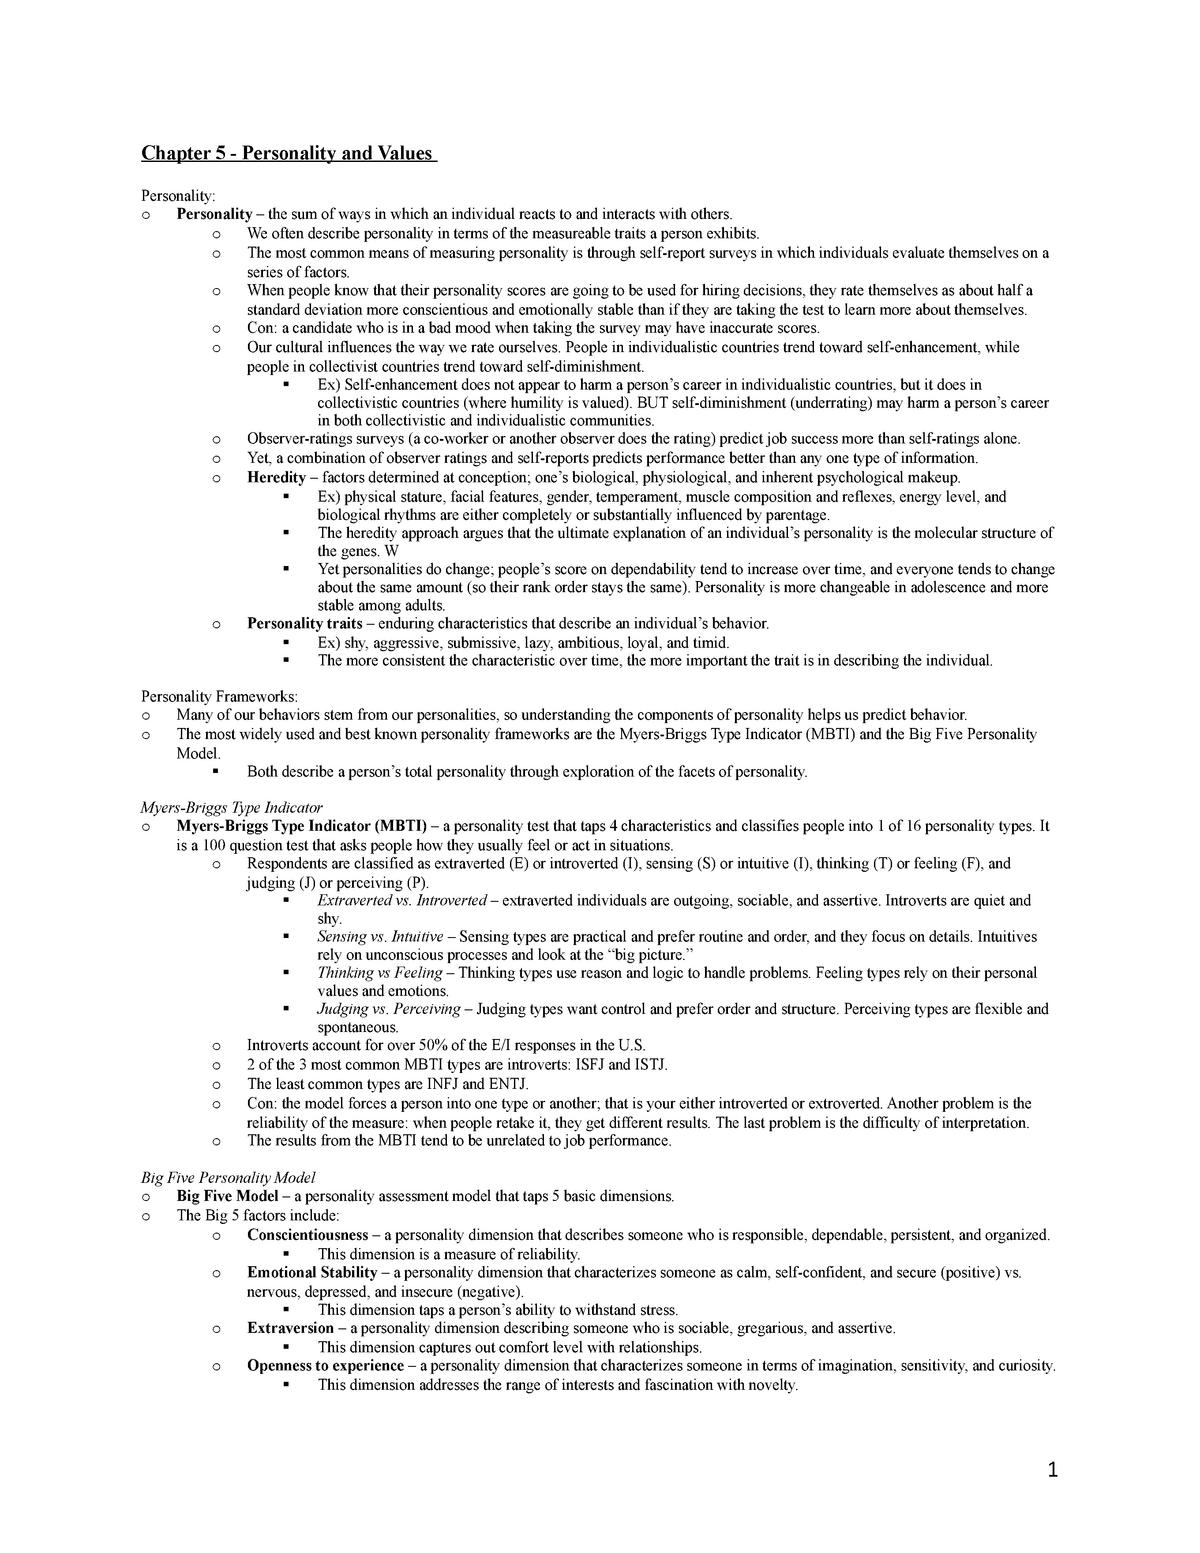 Chapter 5 Study Guide - BA 350 - StuDocu